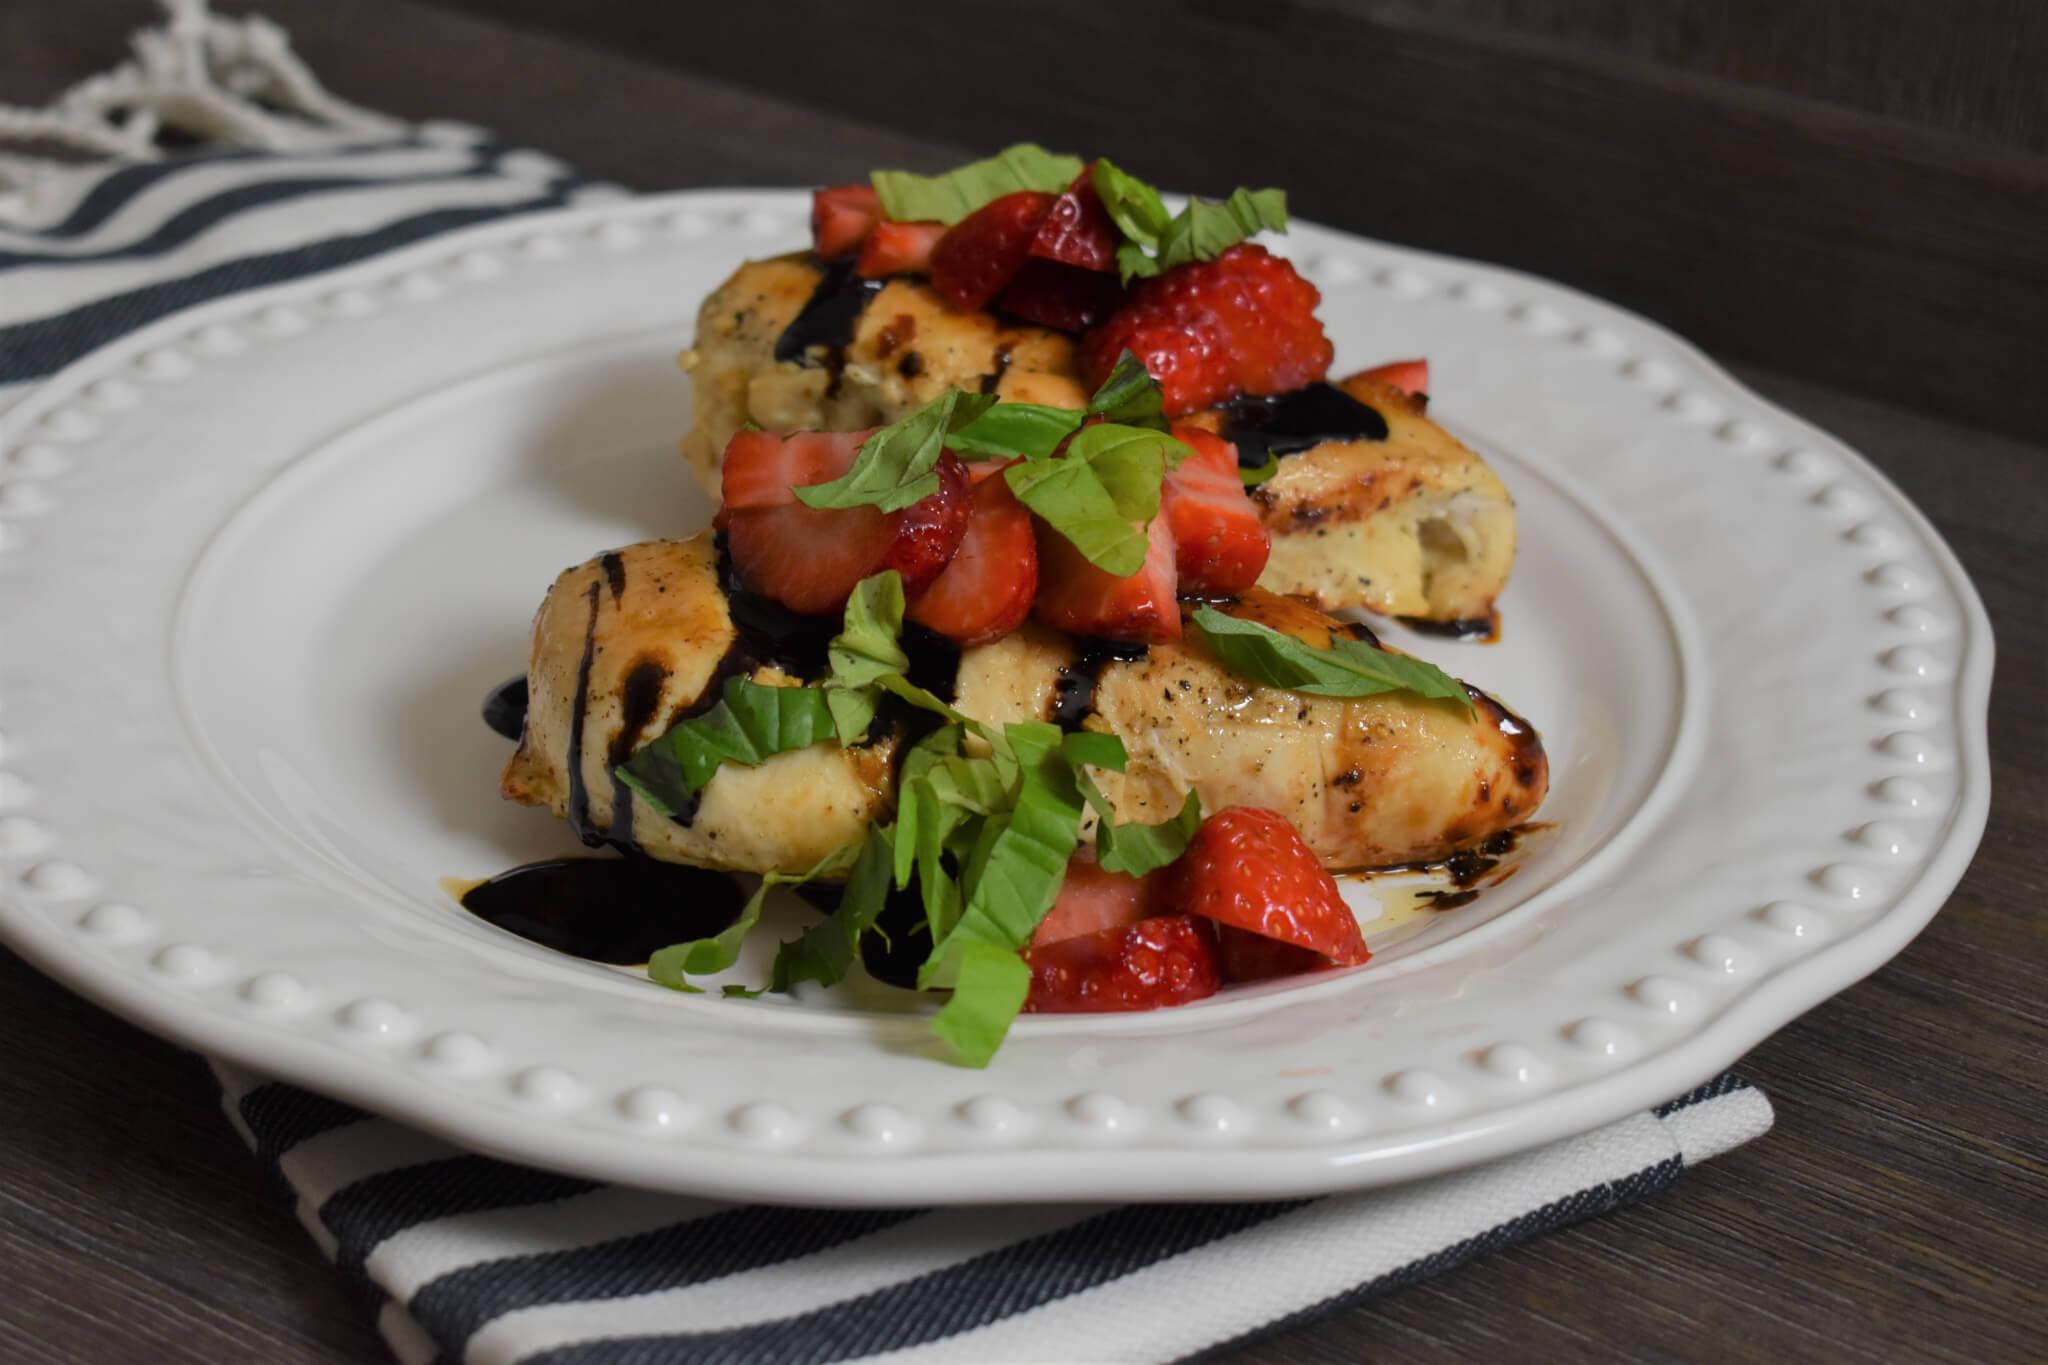 Strawberry Balsamic Glazed Chicken Wish Farms Dinner